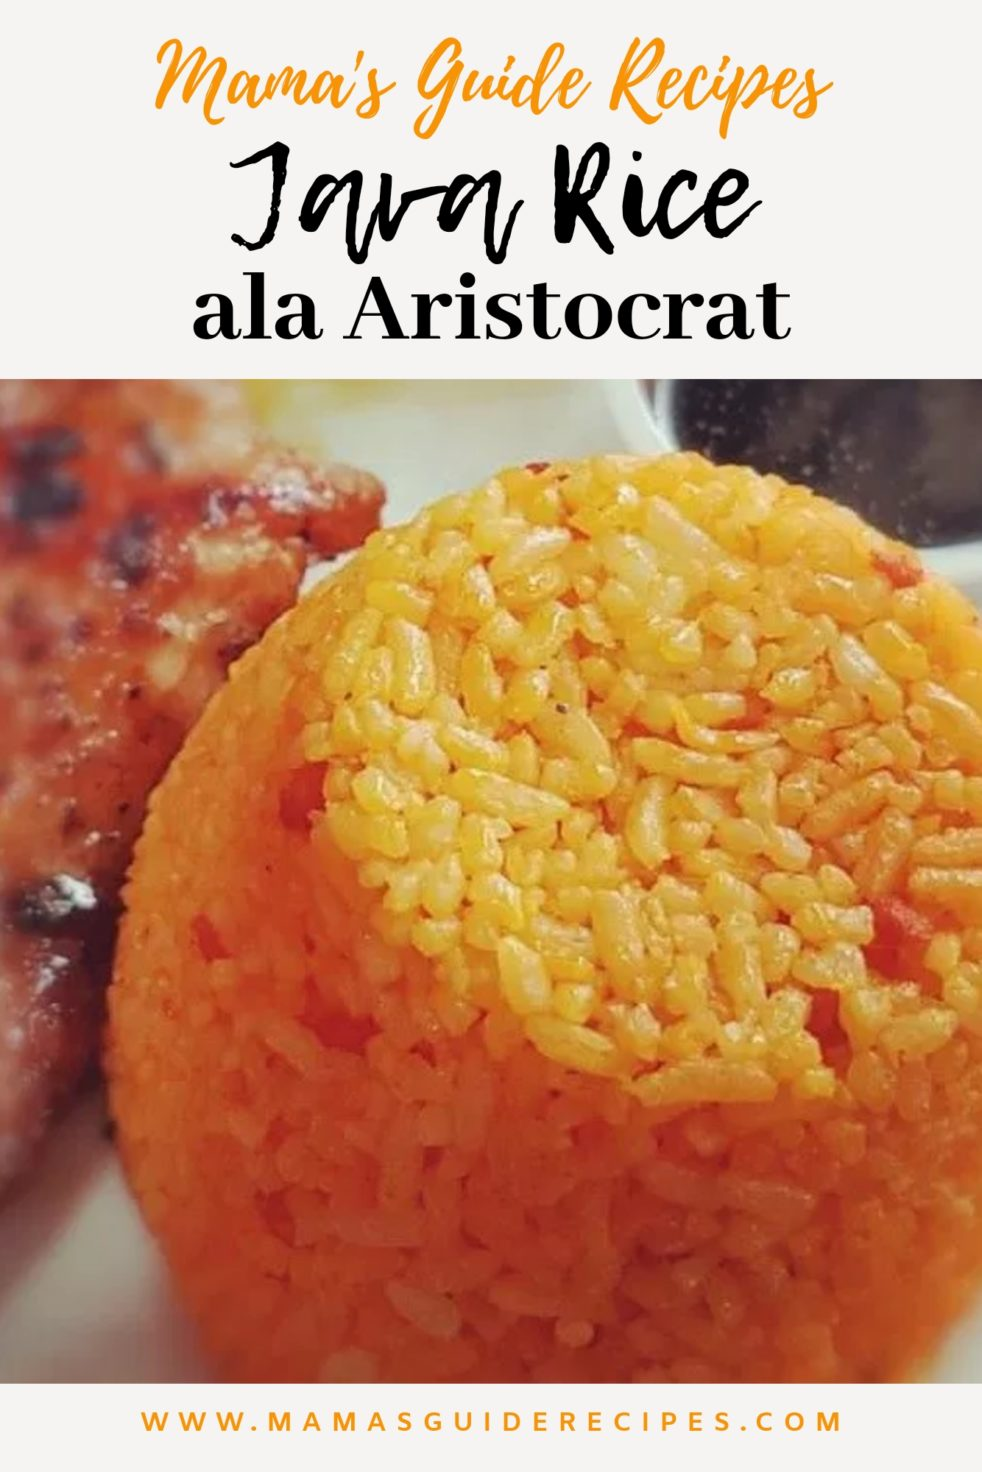 Java Rice Ala Aristocrat